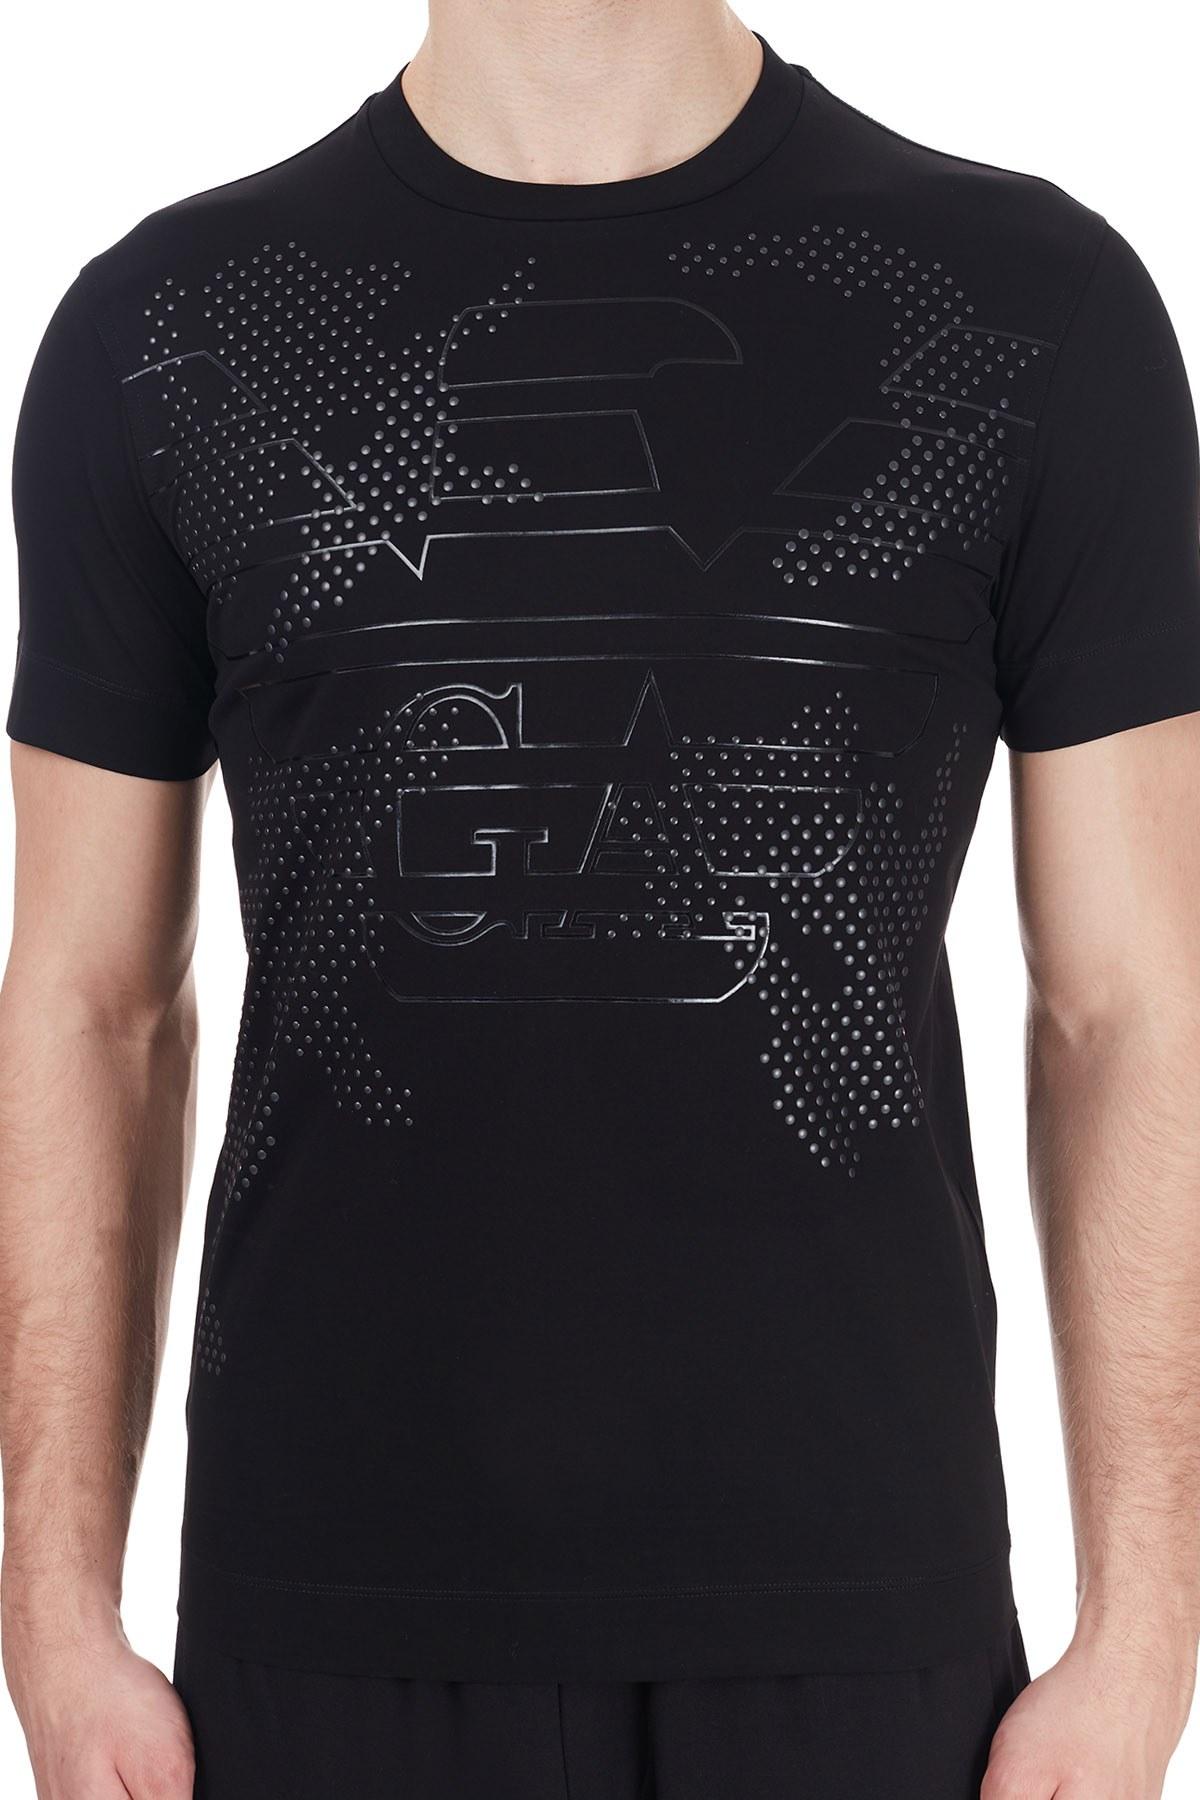 Emporio Armani Baskılı Bisiklet Yaka % 100 Pamuk Erkek T Shirt 6H1TG2 1JTUZ 0999 SİYAH